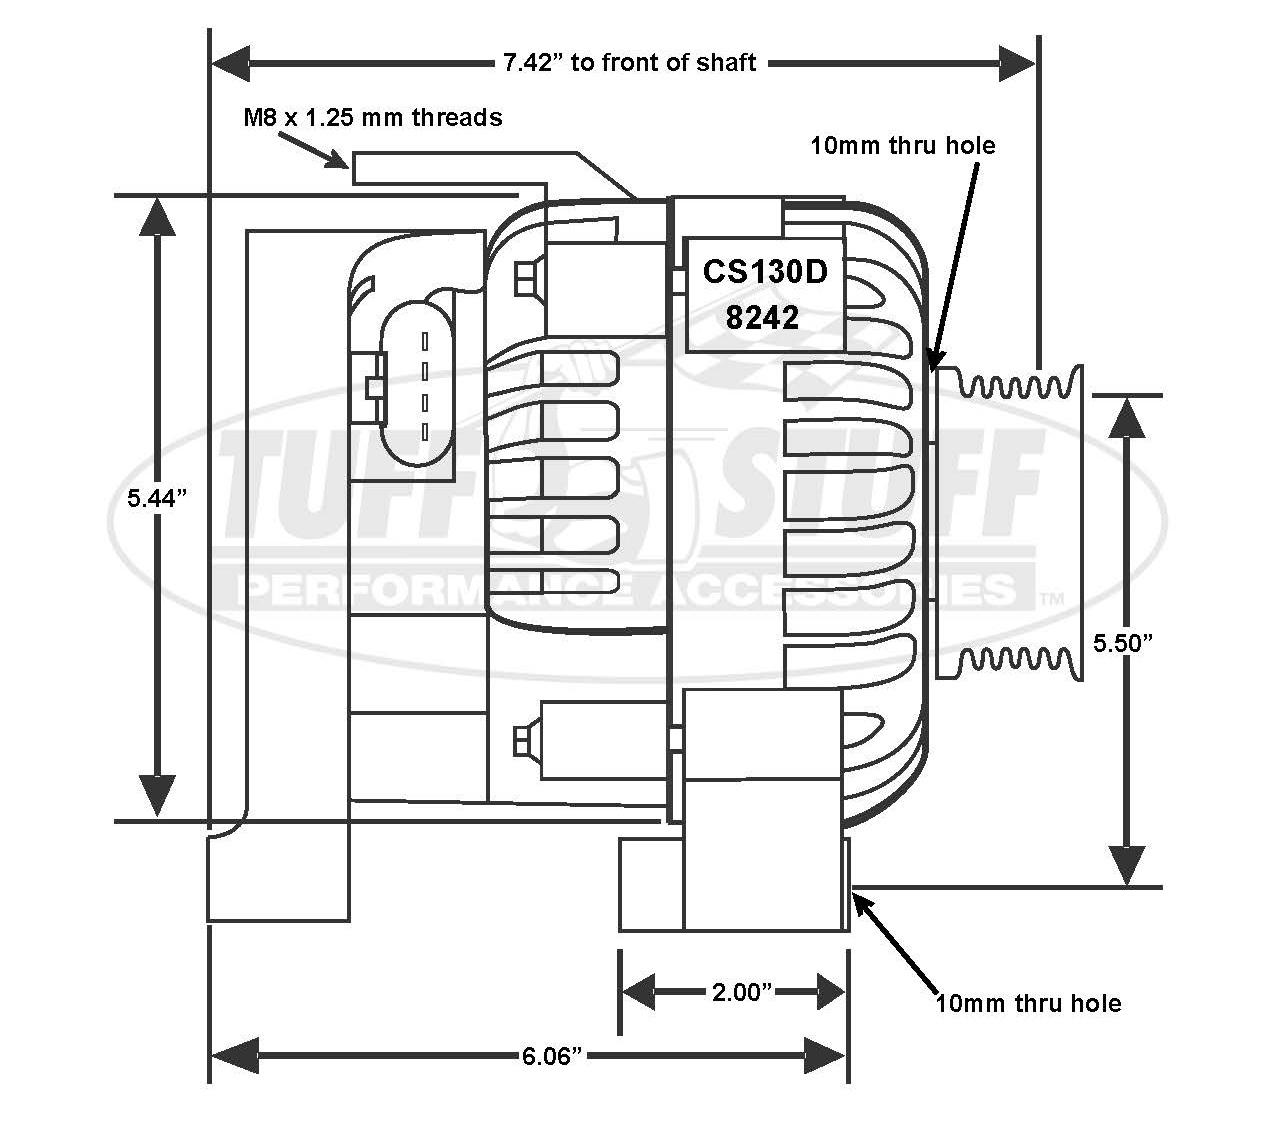 Camaro Ls1 125 Amp Alternator 6 Groove Pulley